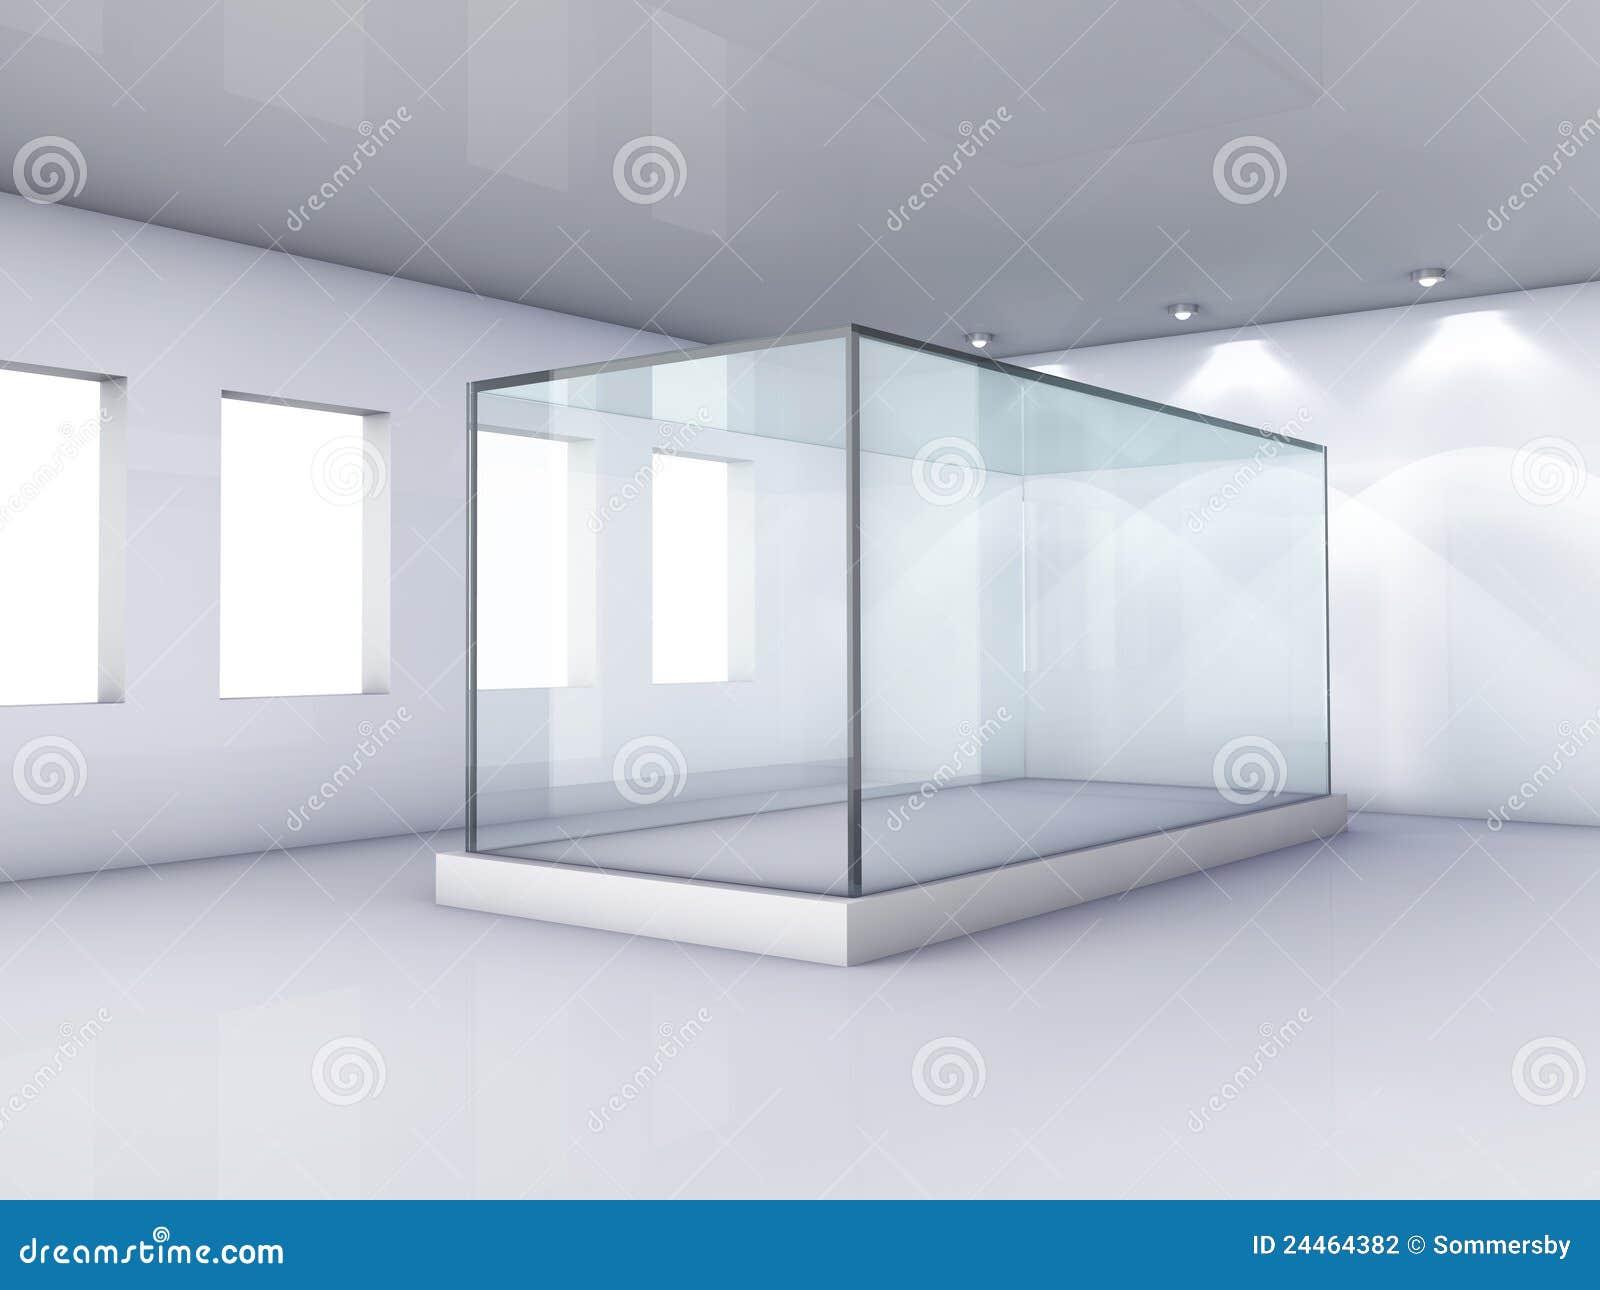 Glass grå lokal ställer ut fönster